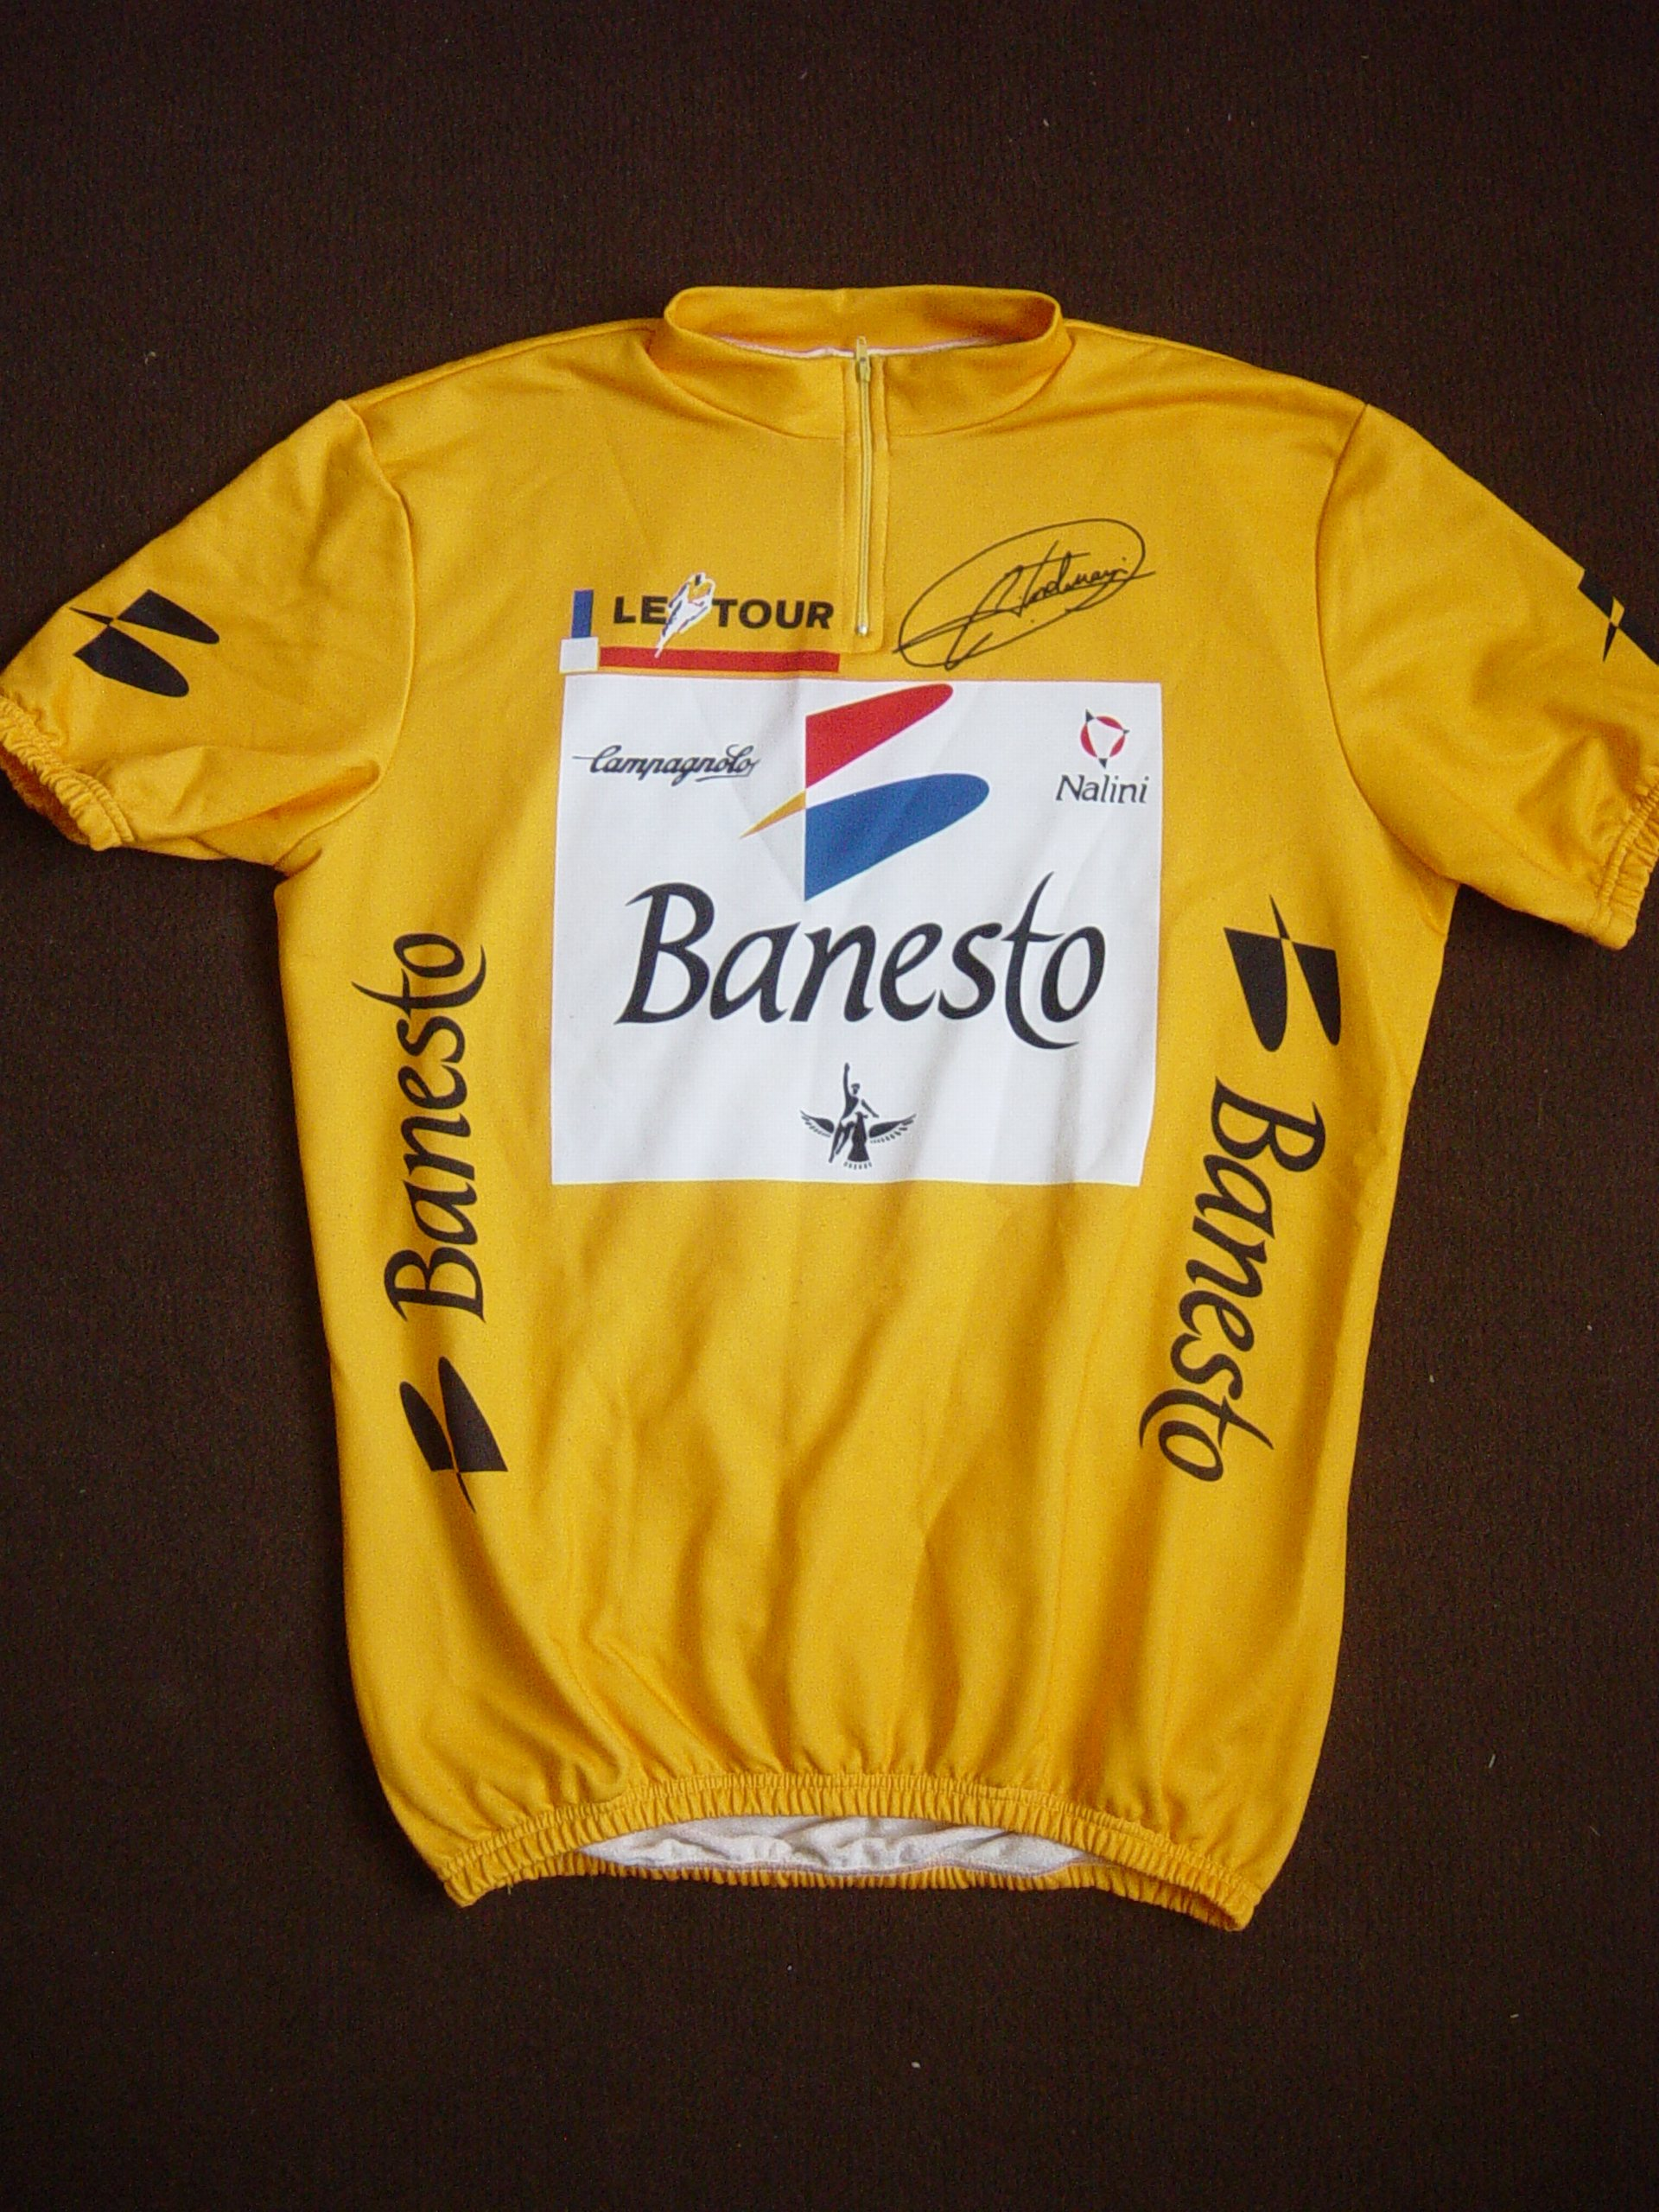 Vélo RAZESA - BANESTO 1991 2981971995maillotjauneBanesto